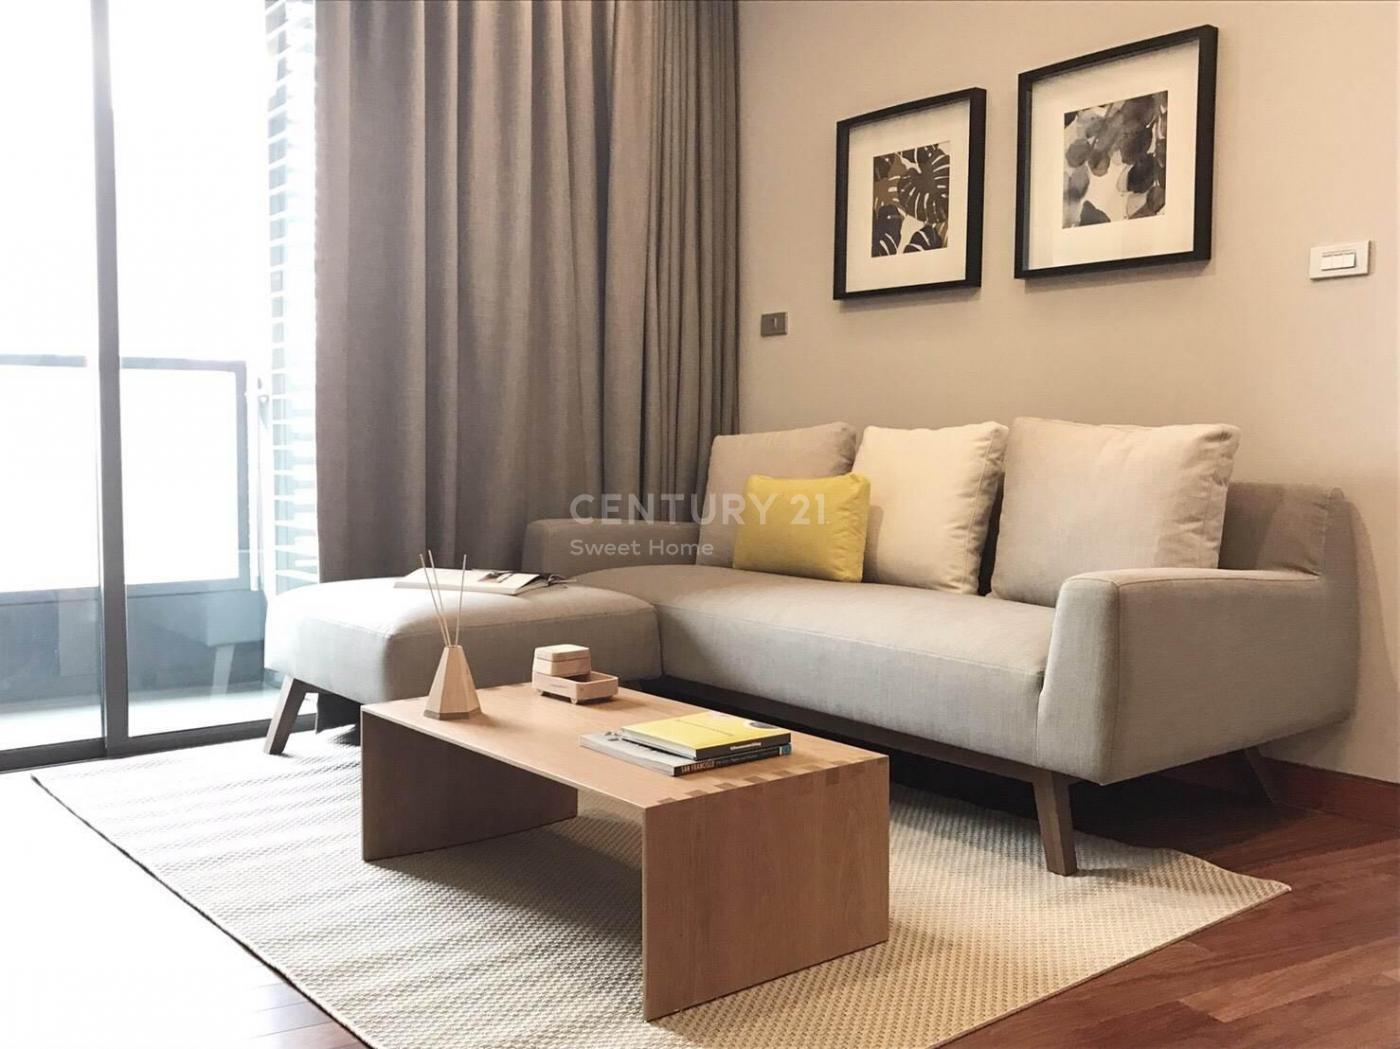 2 bedrooms For Rent in Phrom phong, Bangkok